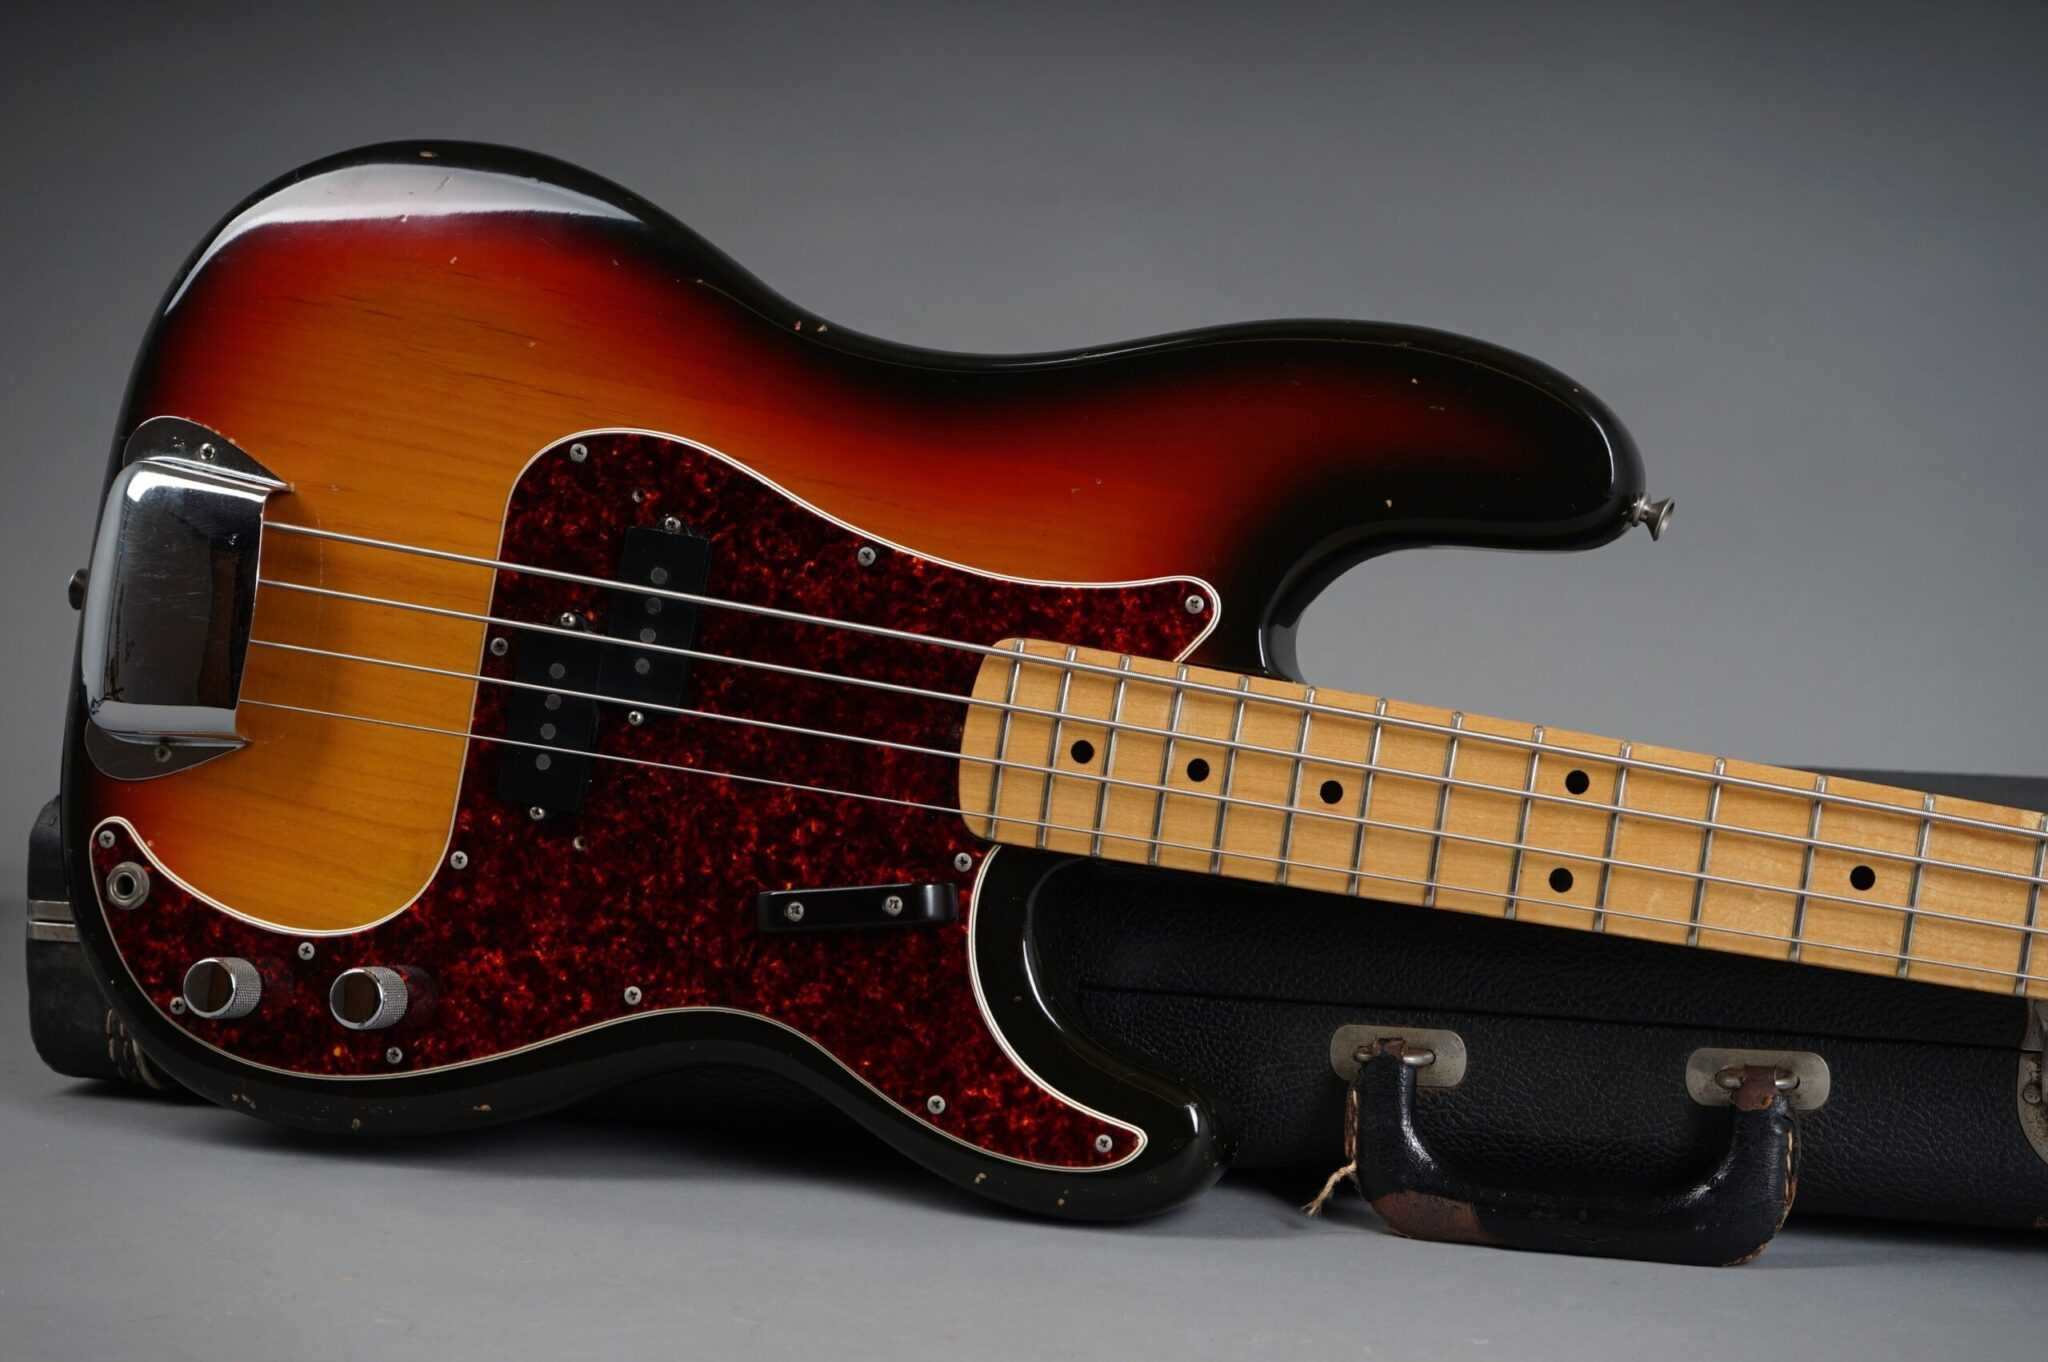 https://guitarpoint.de/app/uploads/products/1972-fender-precision-bass-3t-sunburst-only-38kg/1972-Fender-Precision-3-tone-Sunburst-371090-19-scaled-2048x1362.jpg